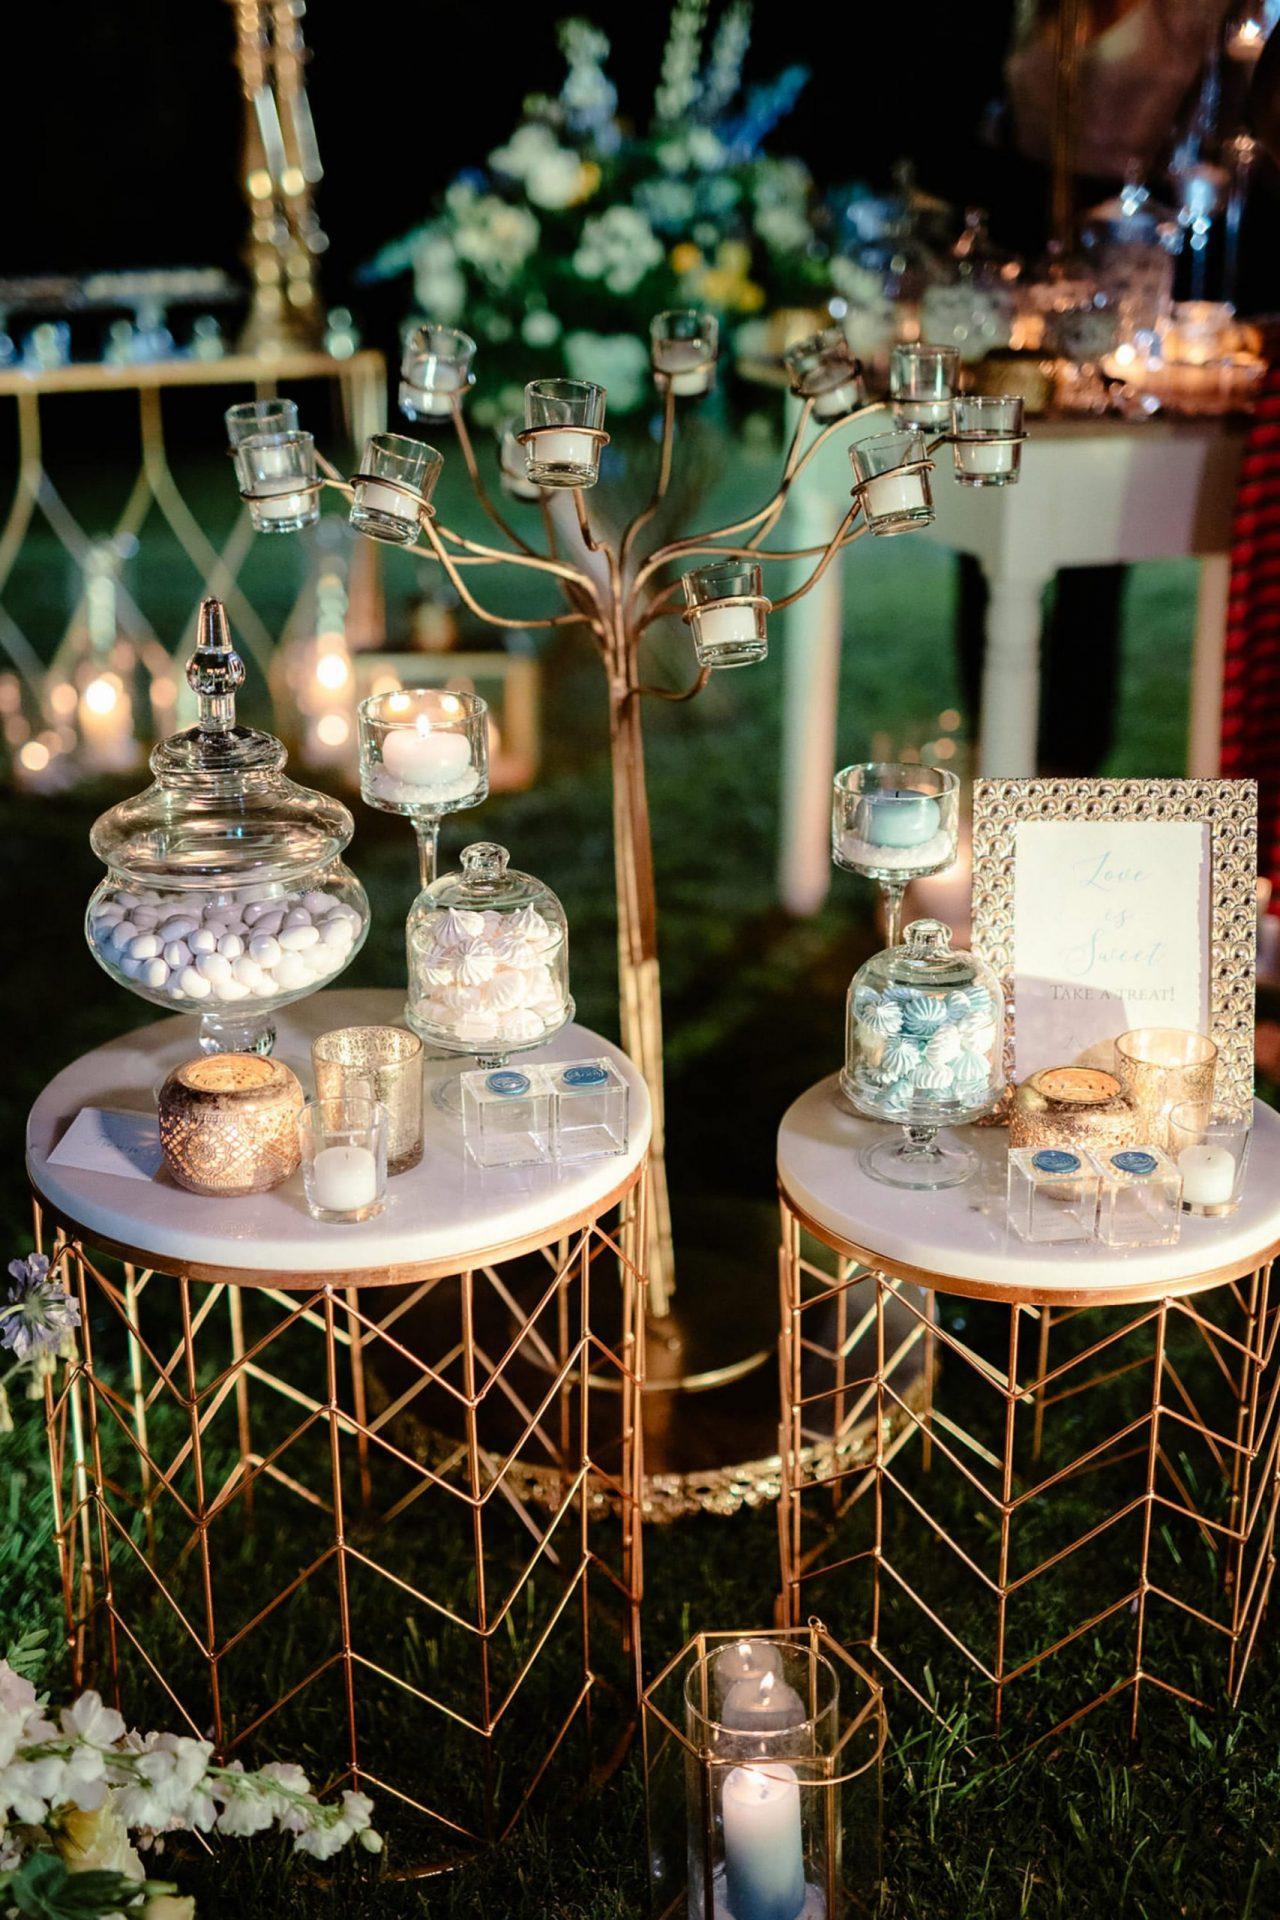 Linda and Enrico, the sweet table decor